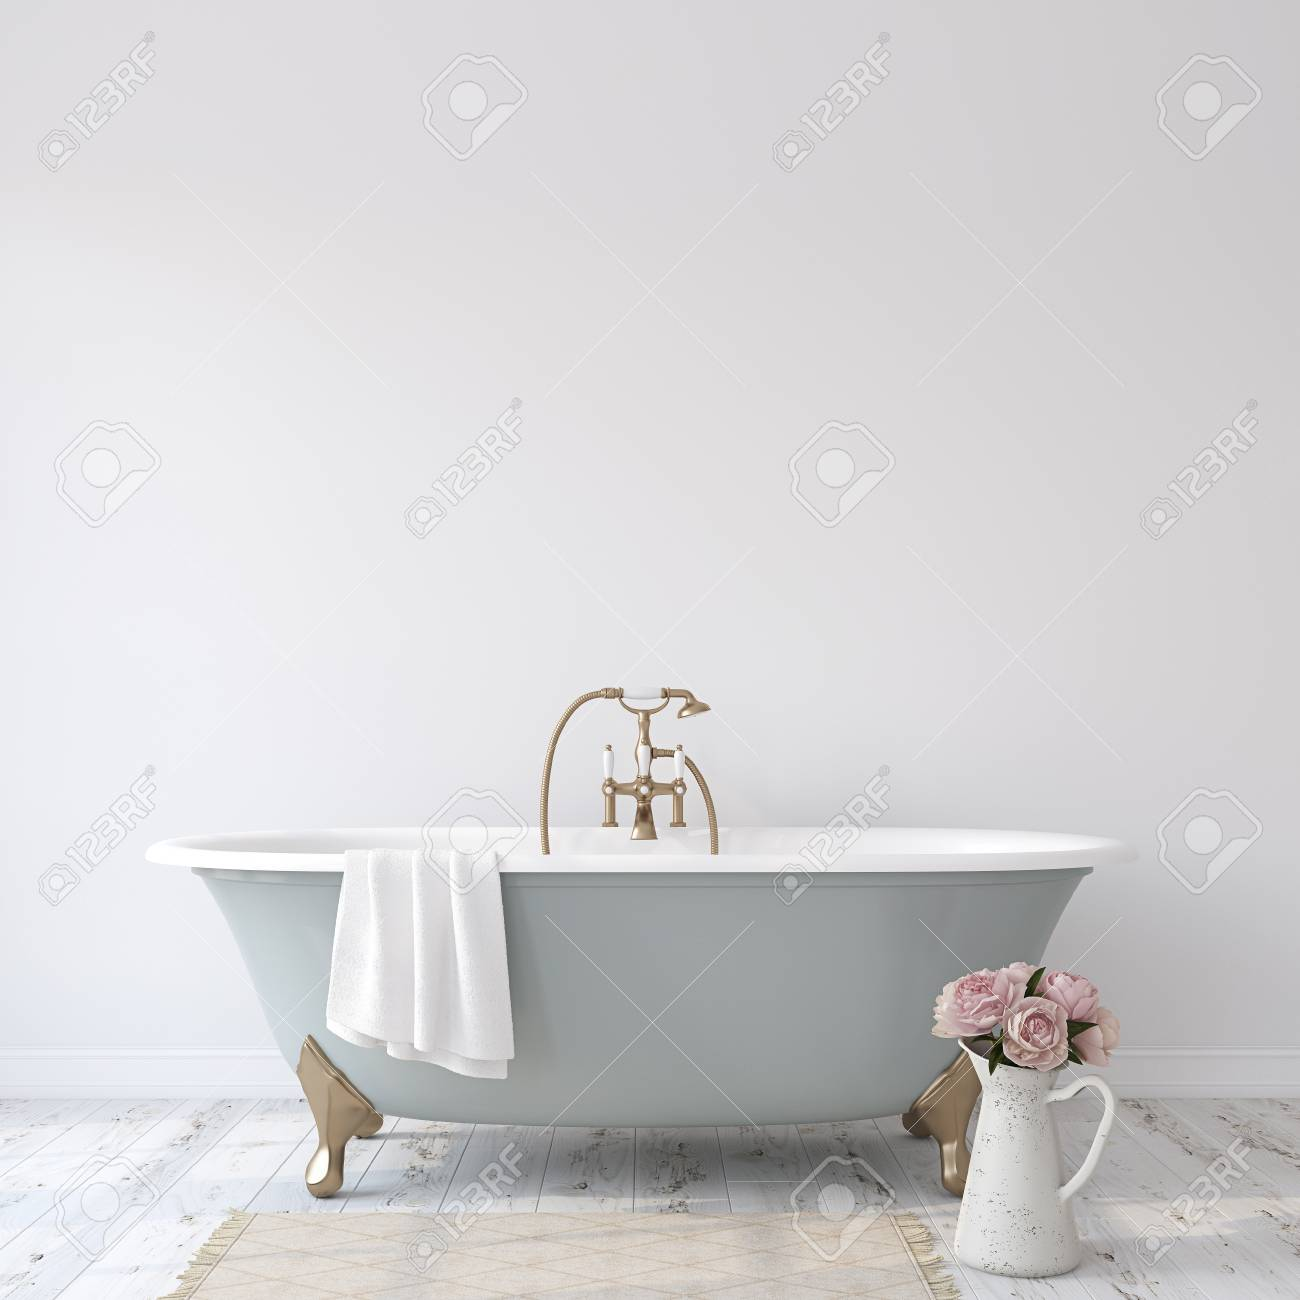 Romance bathroom. Interior mock-up. 3d render. - 118411776